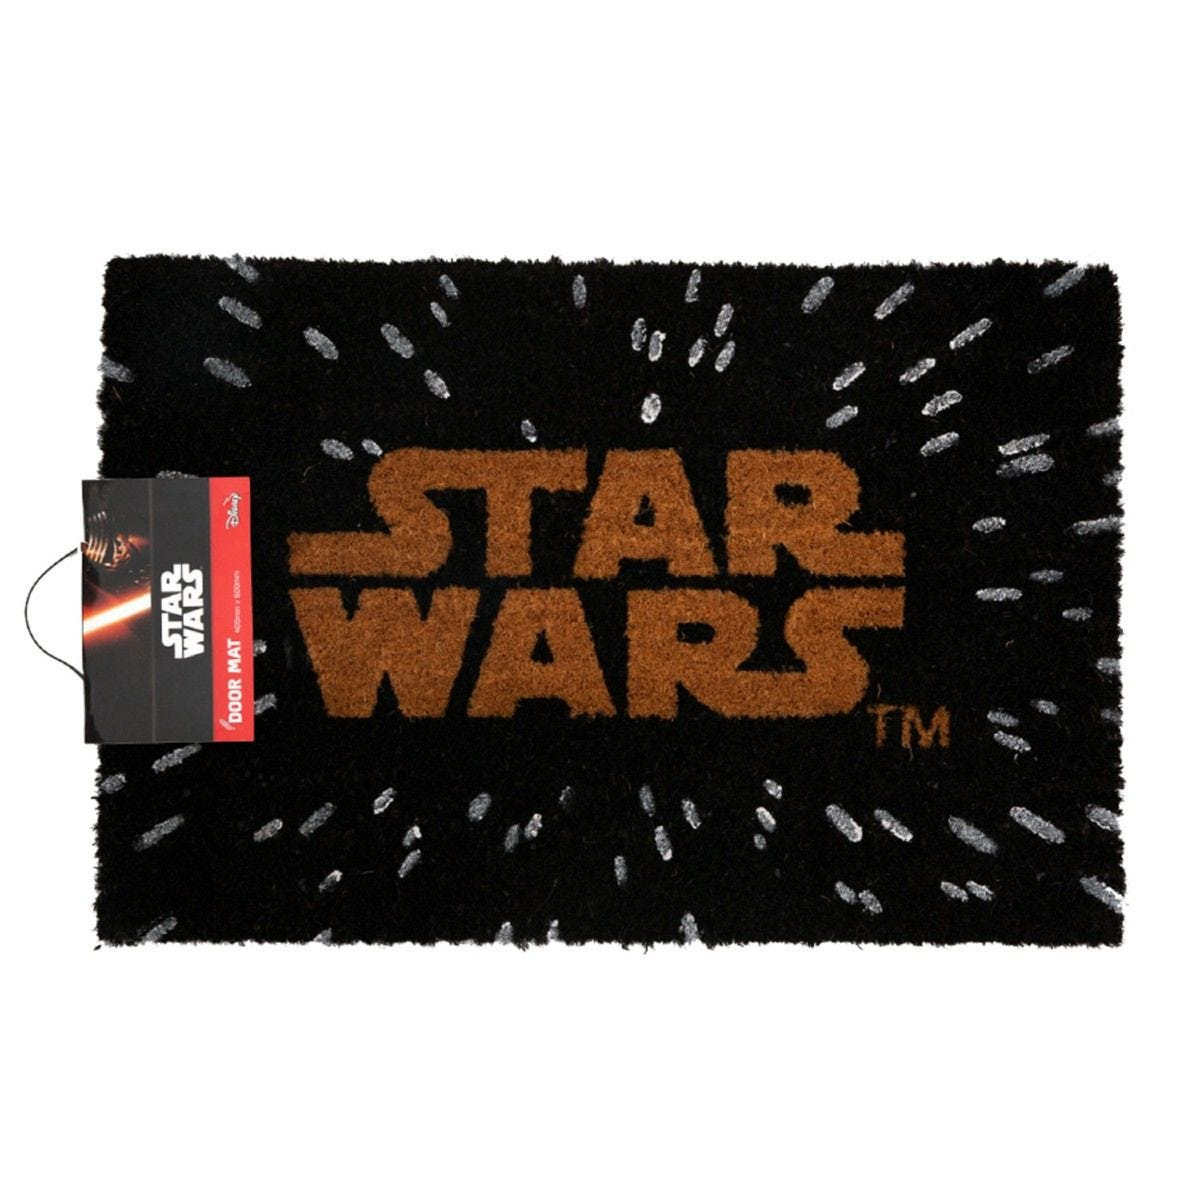 Star Wars Logo Doormat - Black